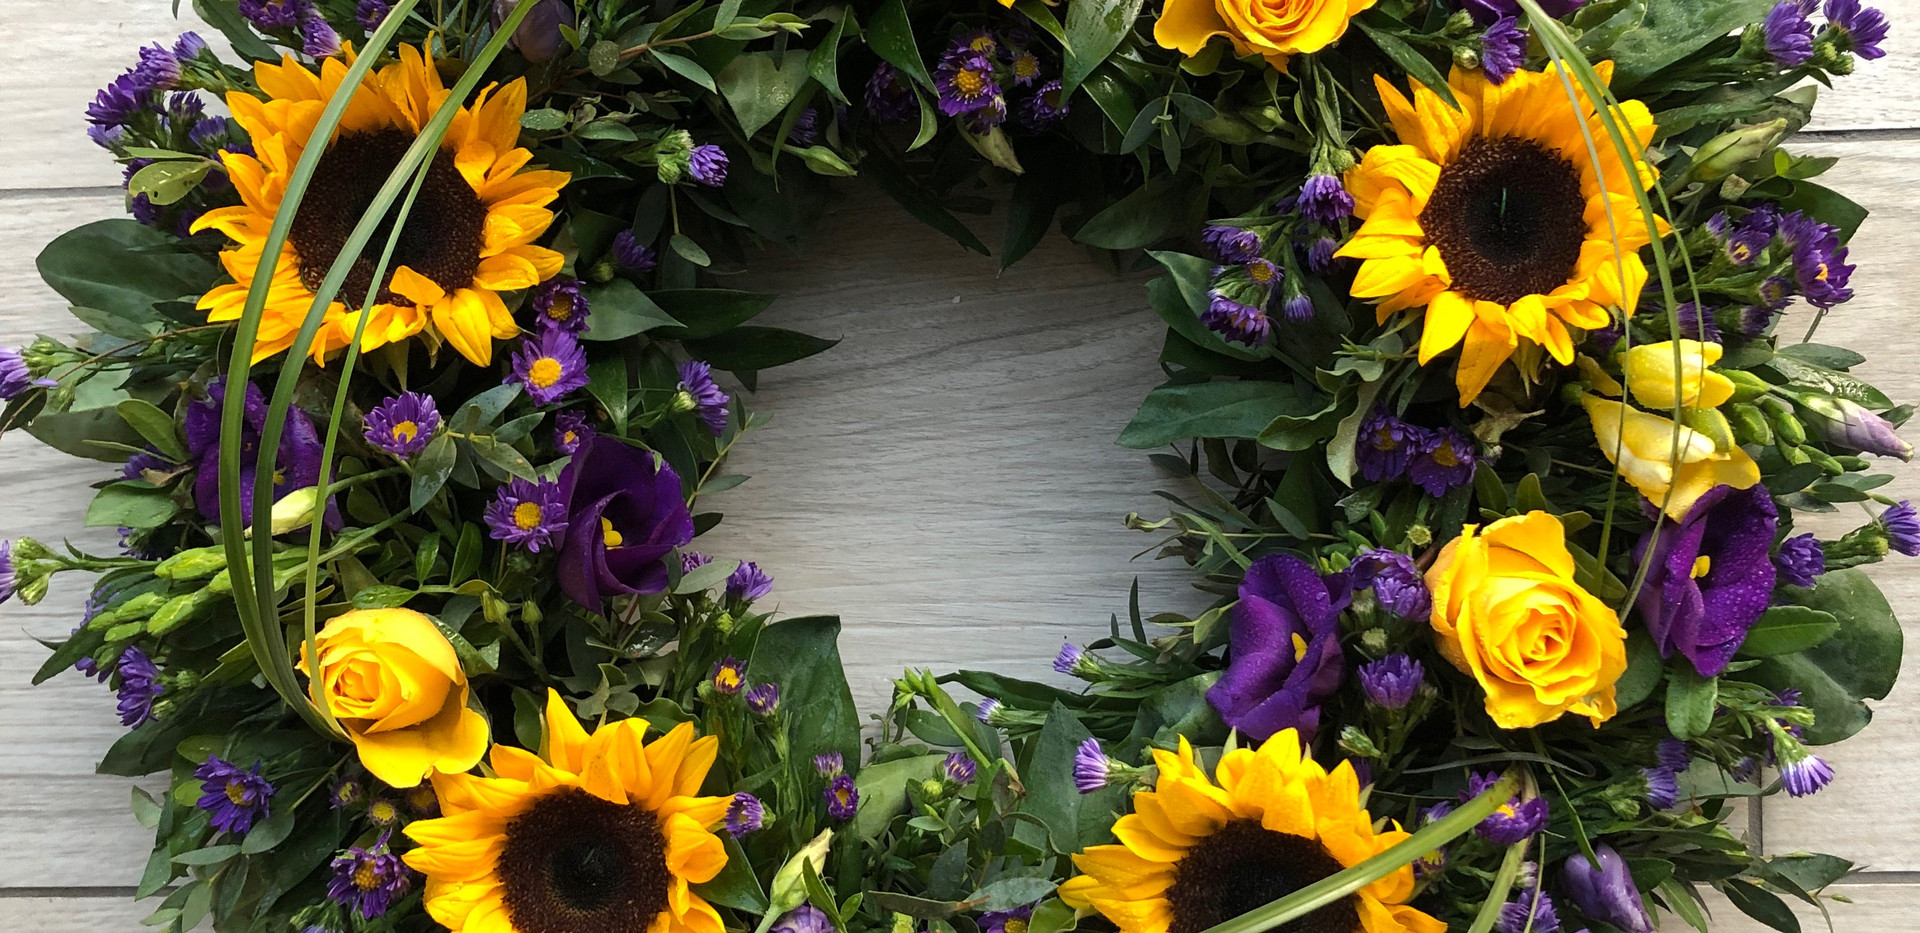 Sunflower wreath with beargrass.JPG